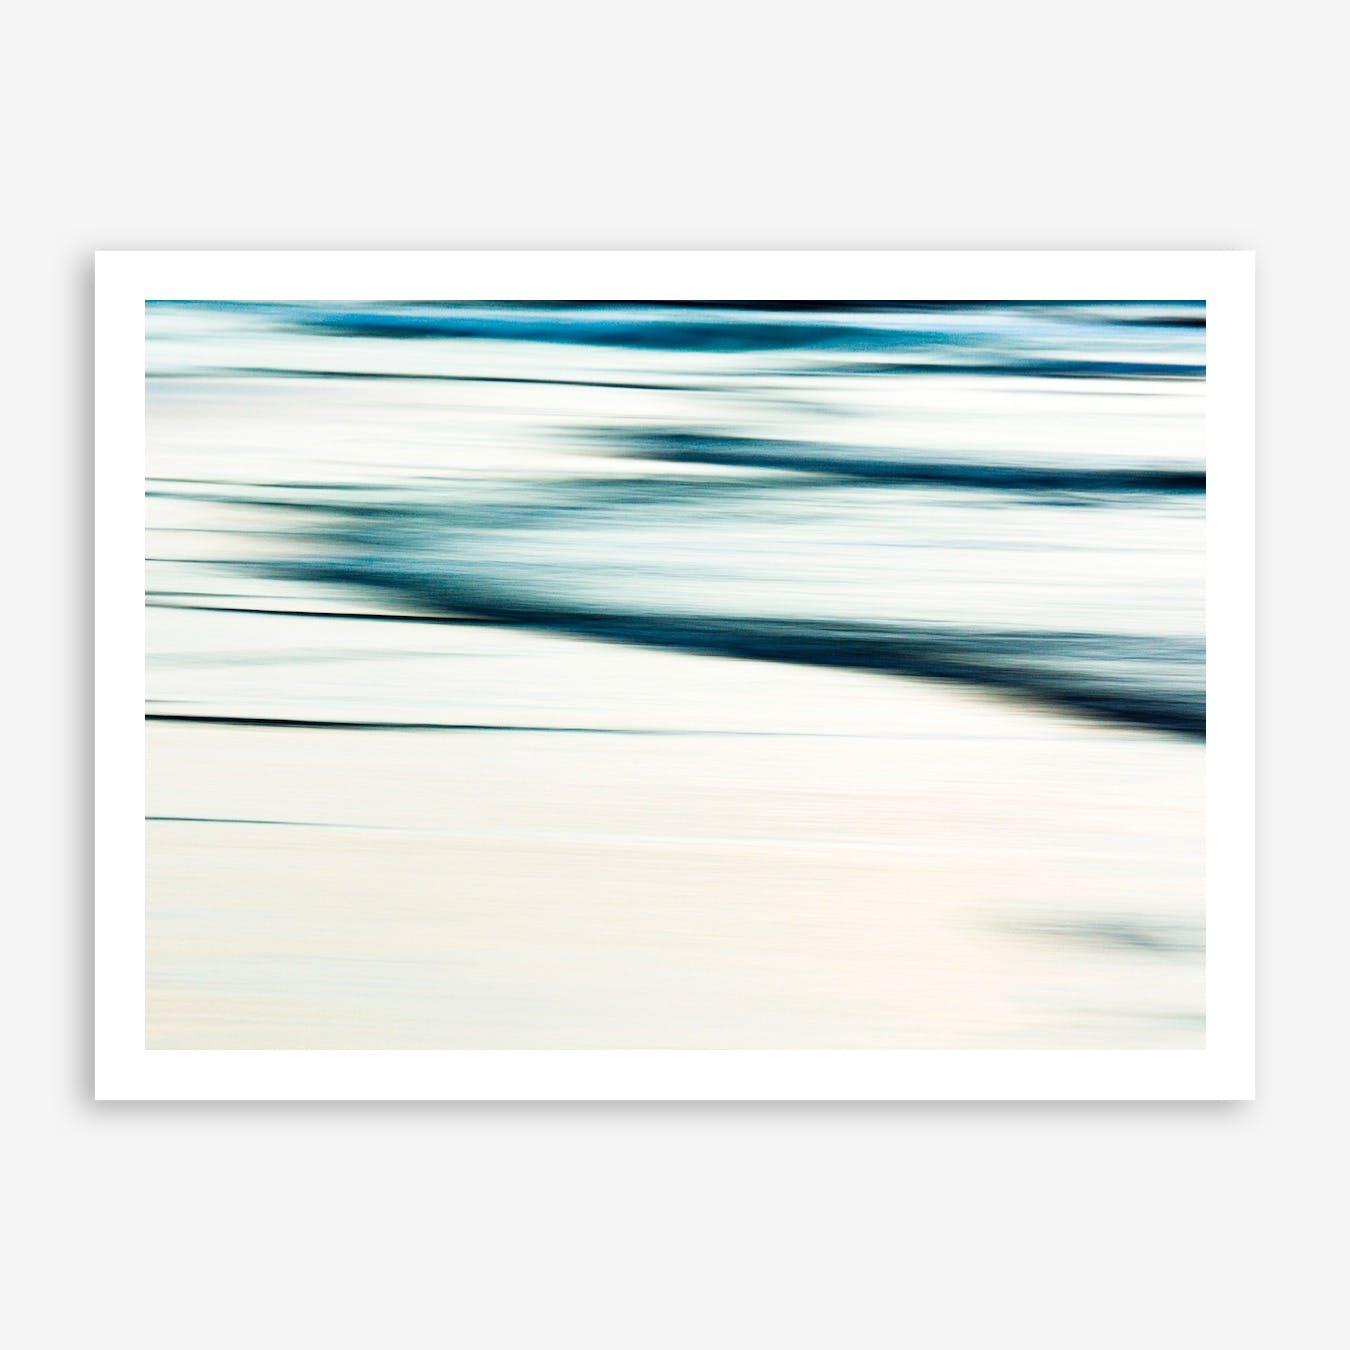 My Bleeding Heart Soul Of The Ocean Print